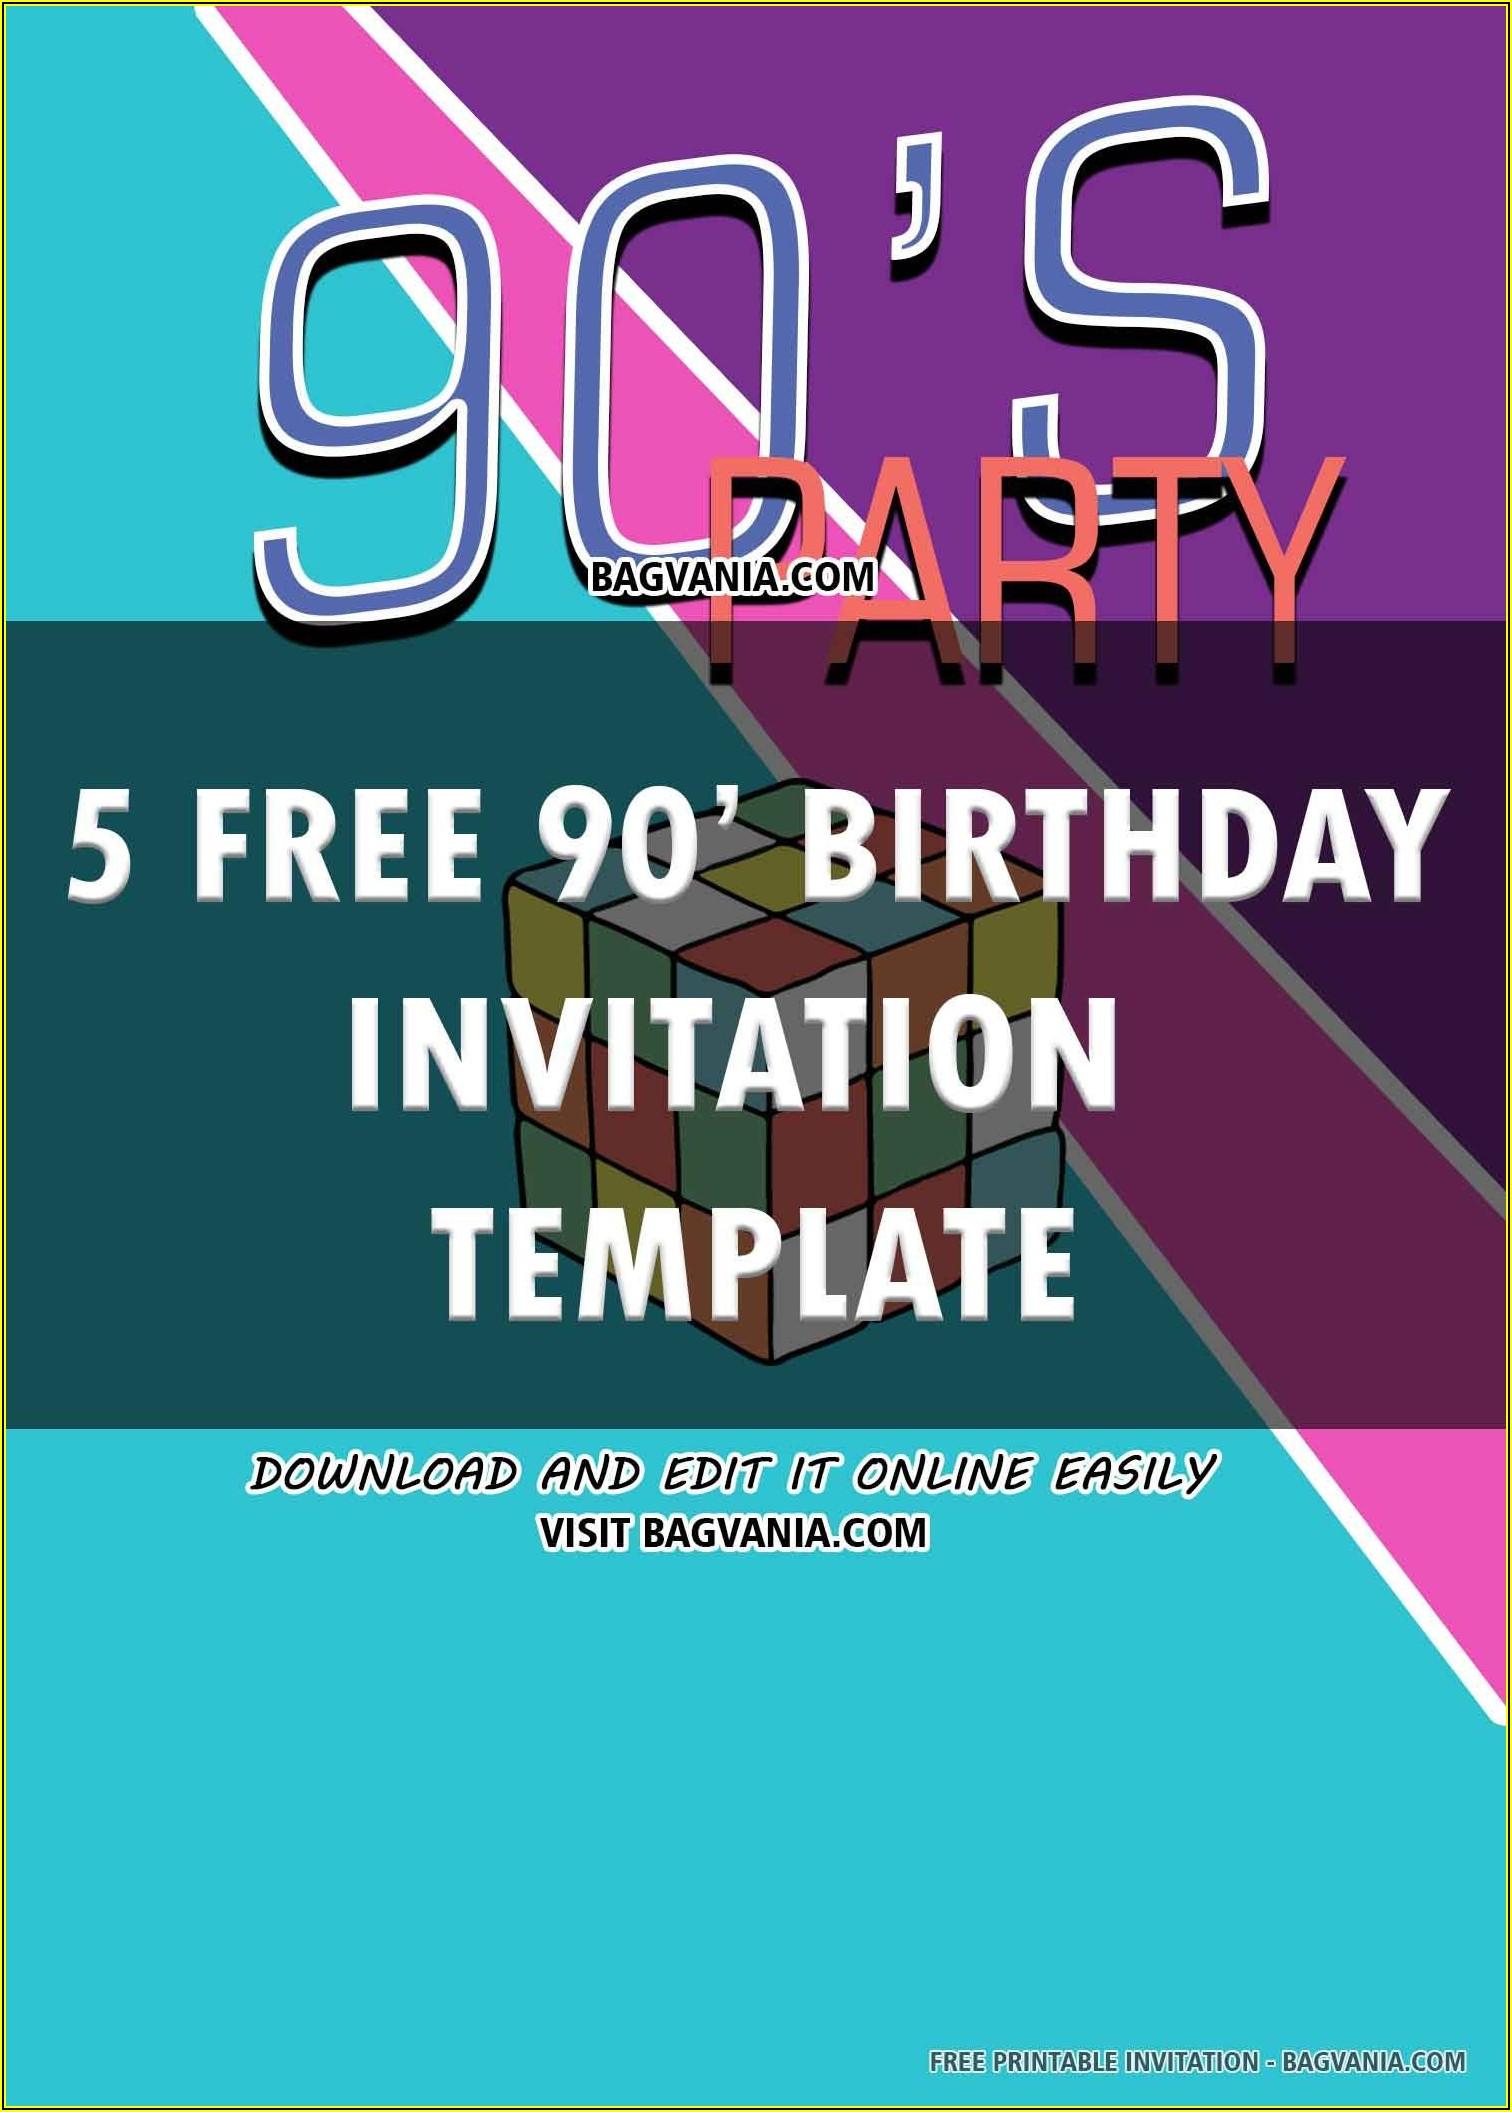 Free 90's Birthday Invitation Templates